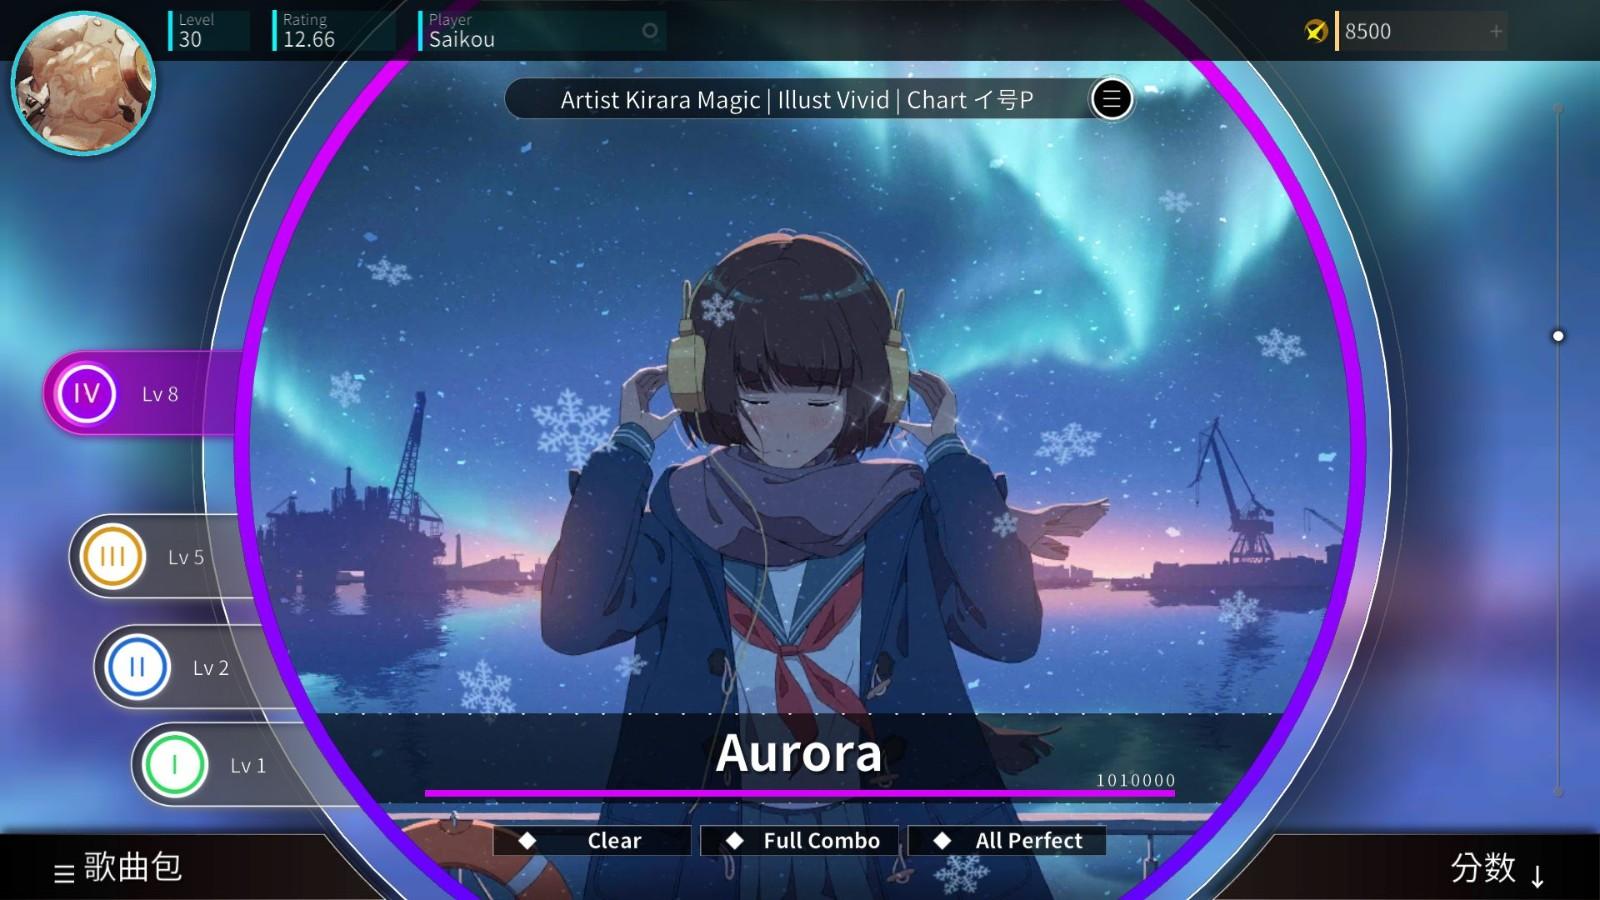 rotaeno旋转音律游戏下载官方版